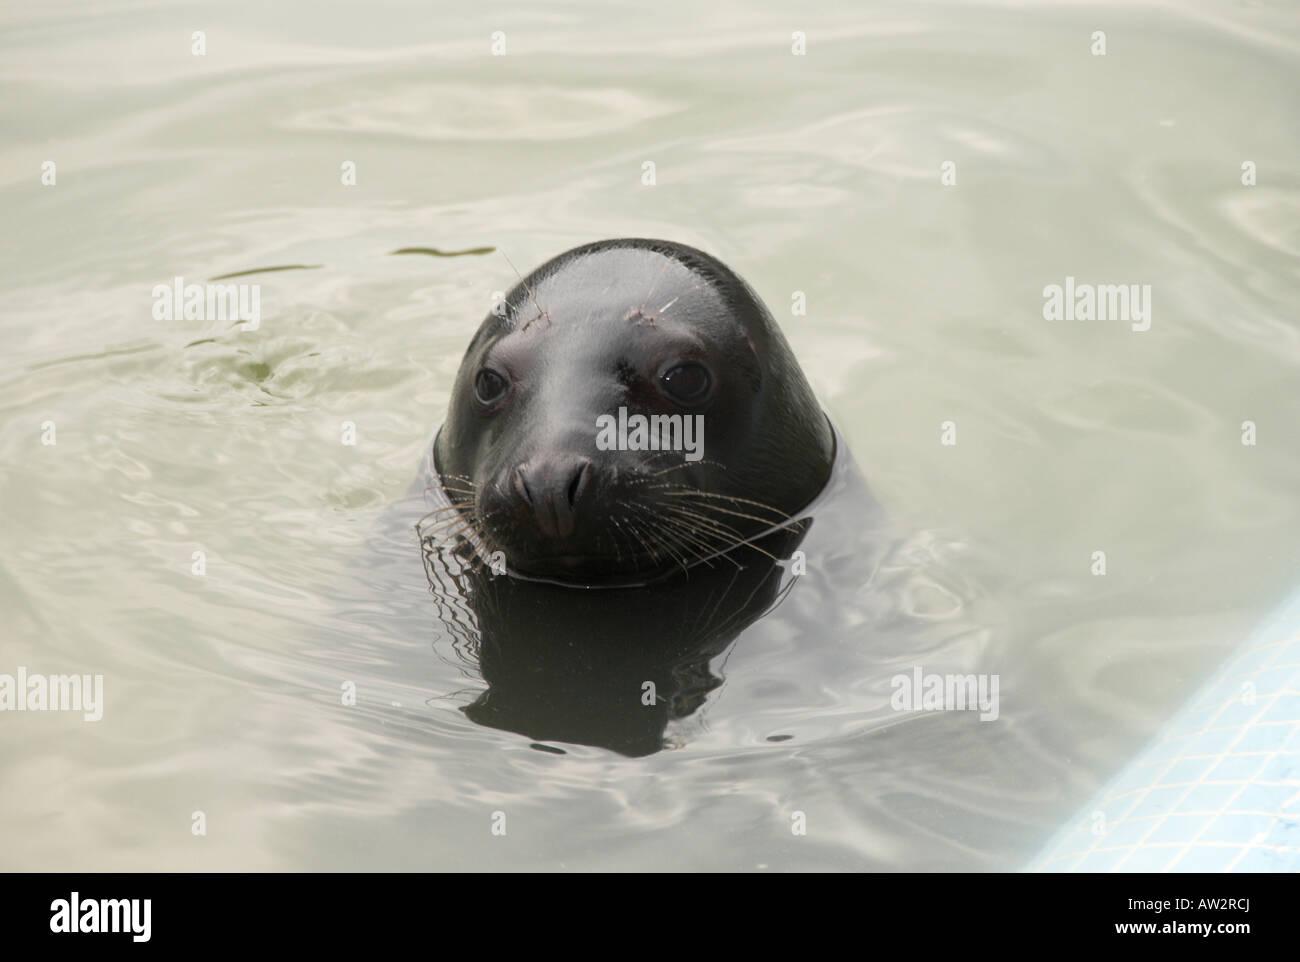 single seal at seal sanctuary Gweek Cornwall England UK Stock Photo